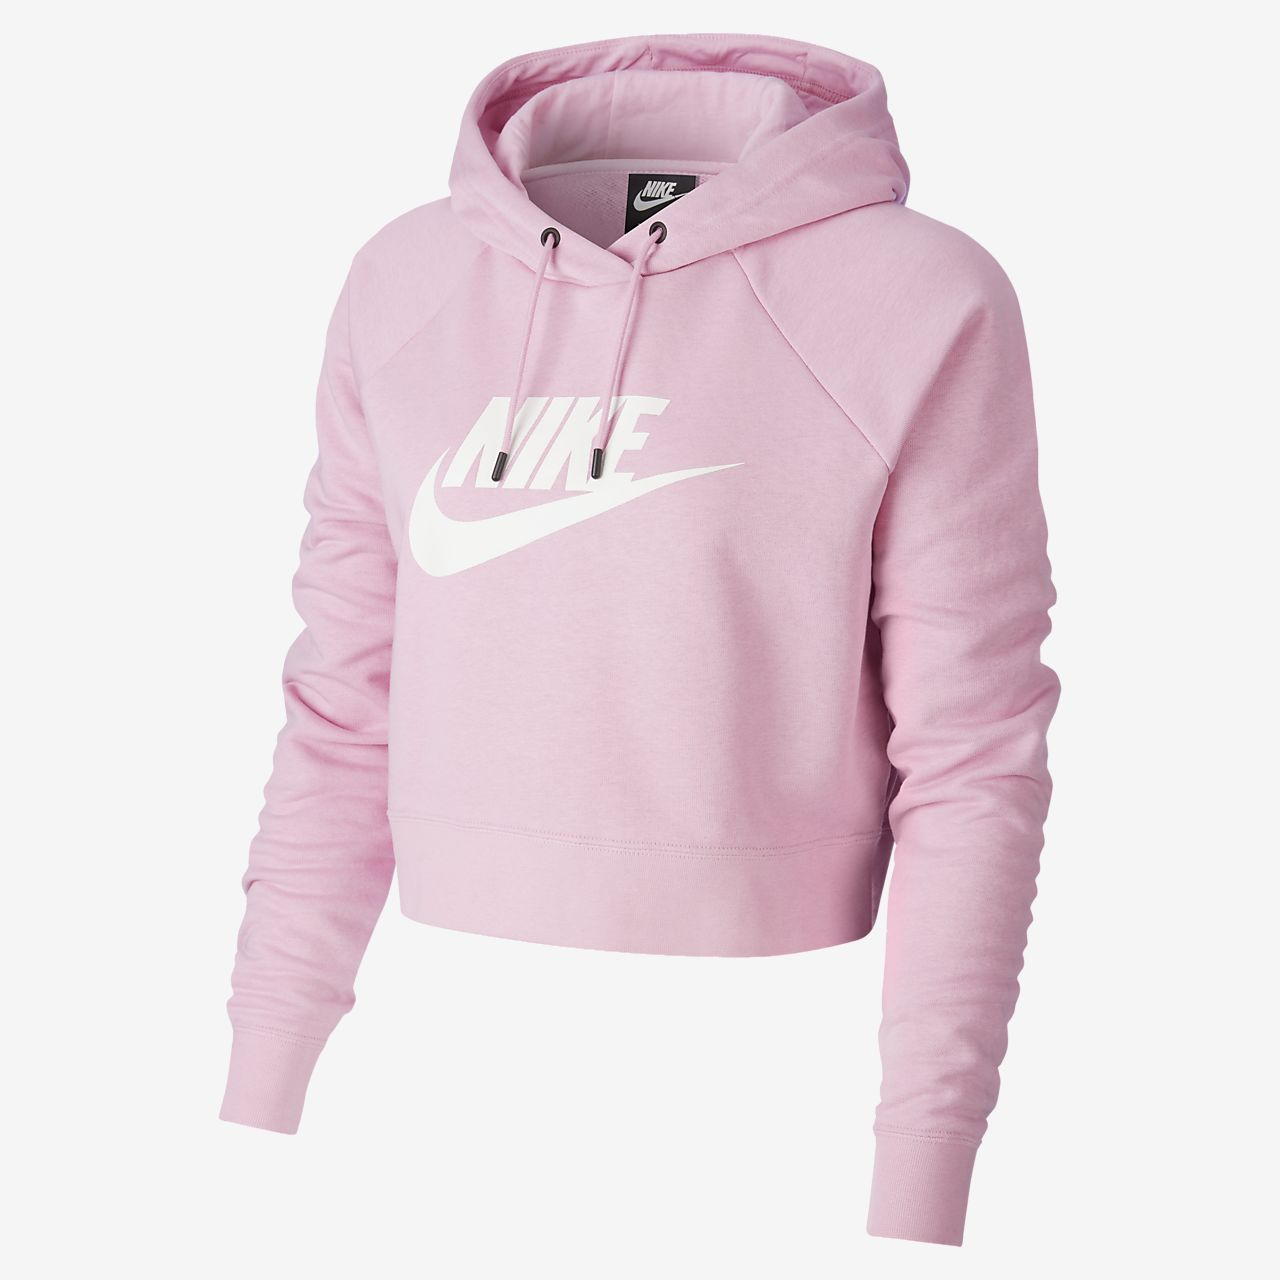 Nike Sportswear Essential Sudadera con capucha corta Mujer